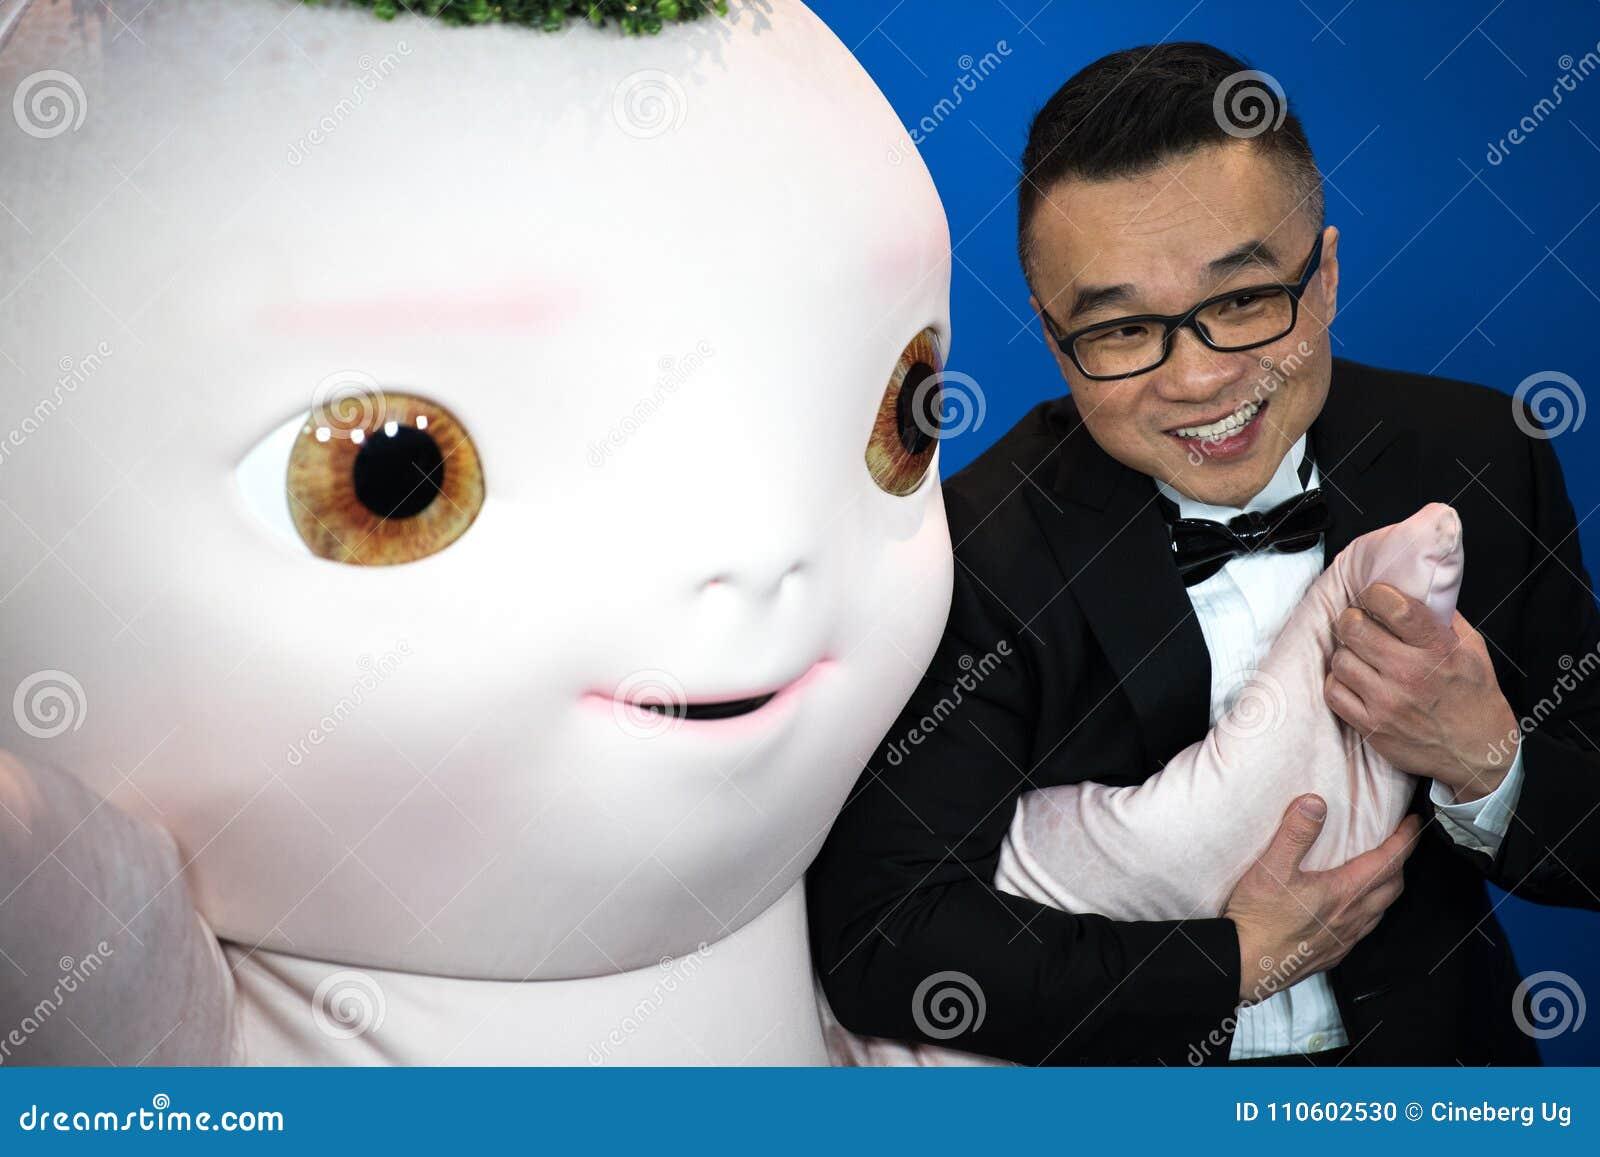 Director Raman Hui And `Buba Monster` Pose During Berlinale